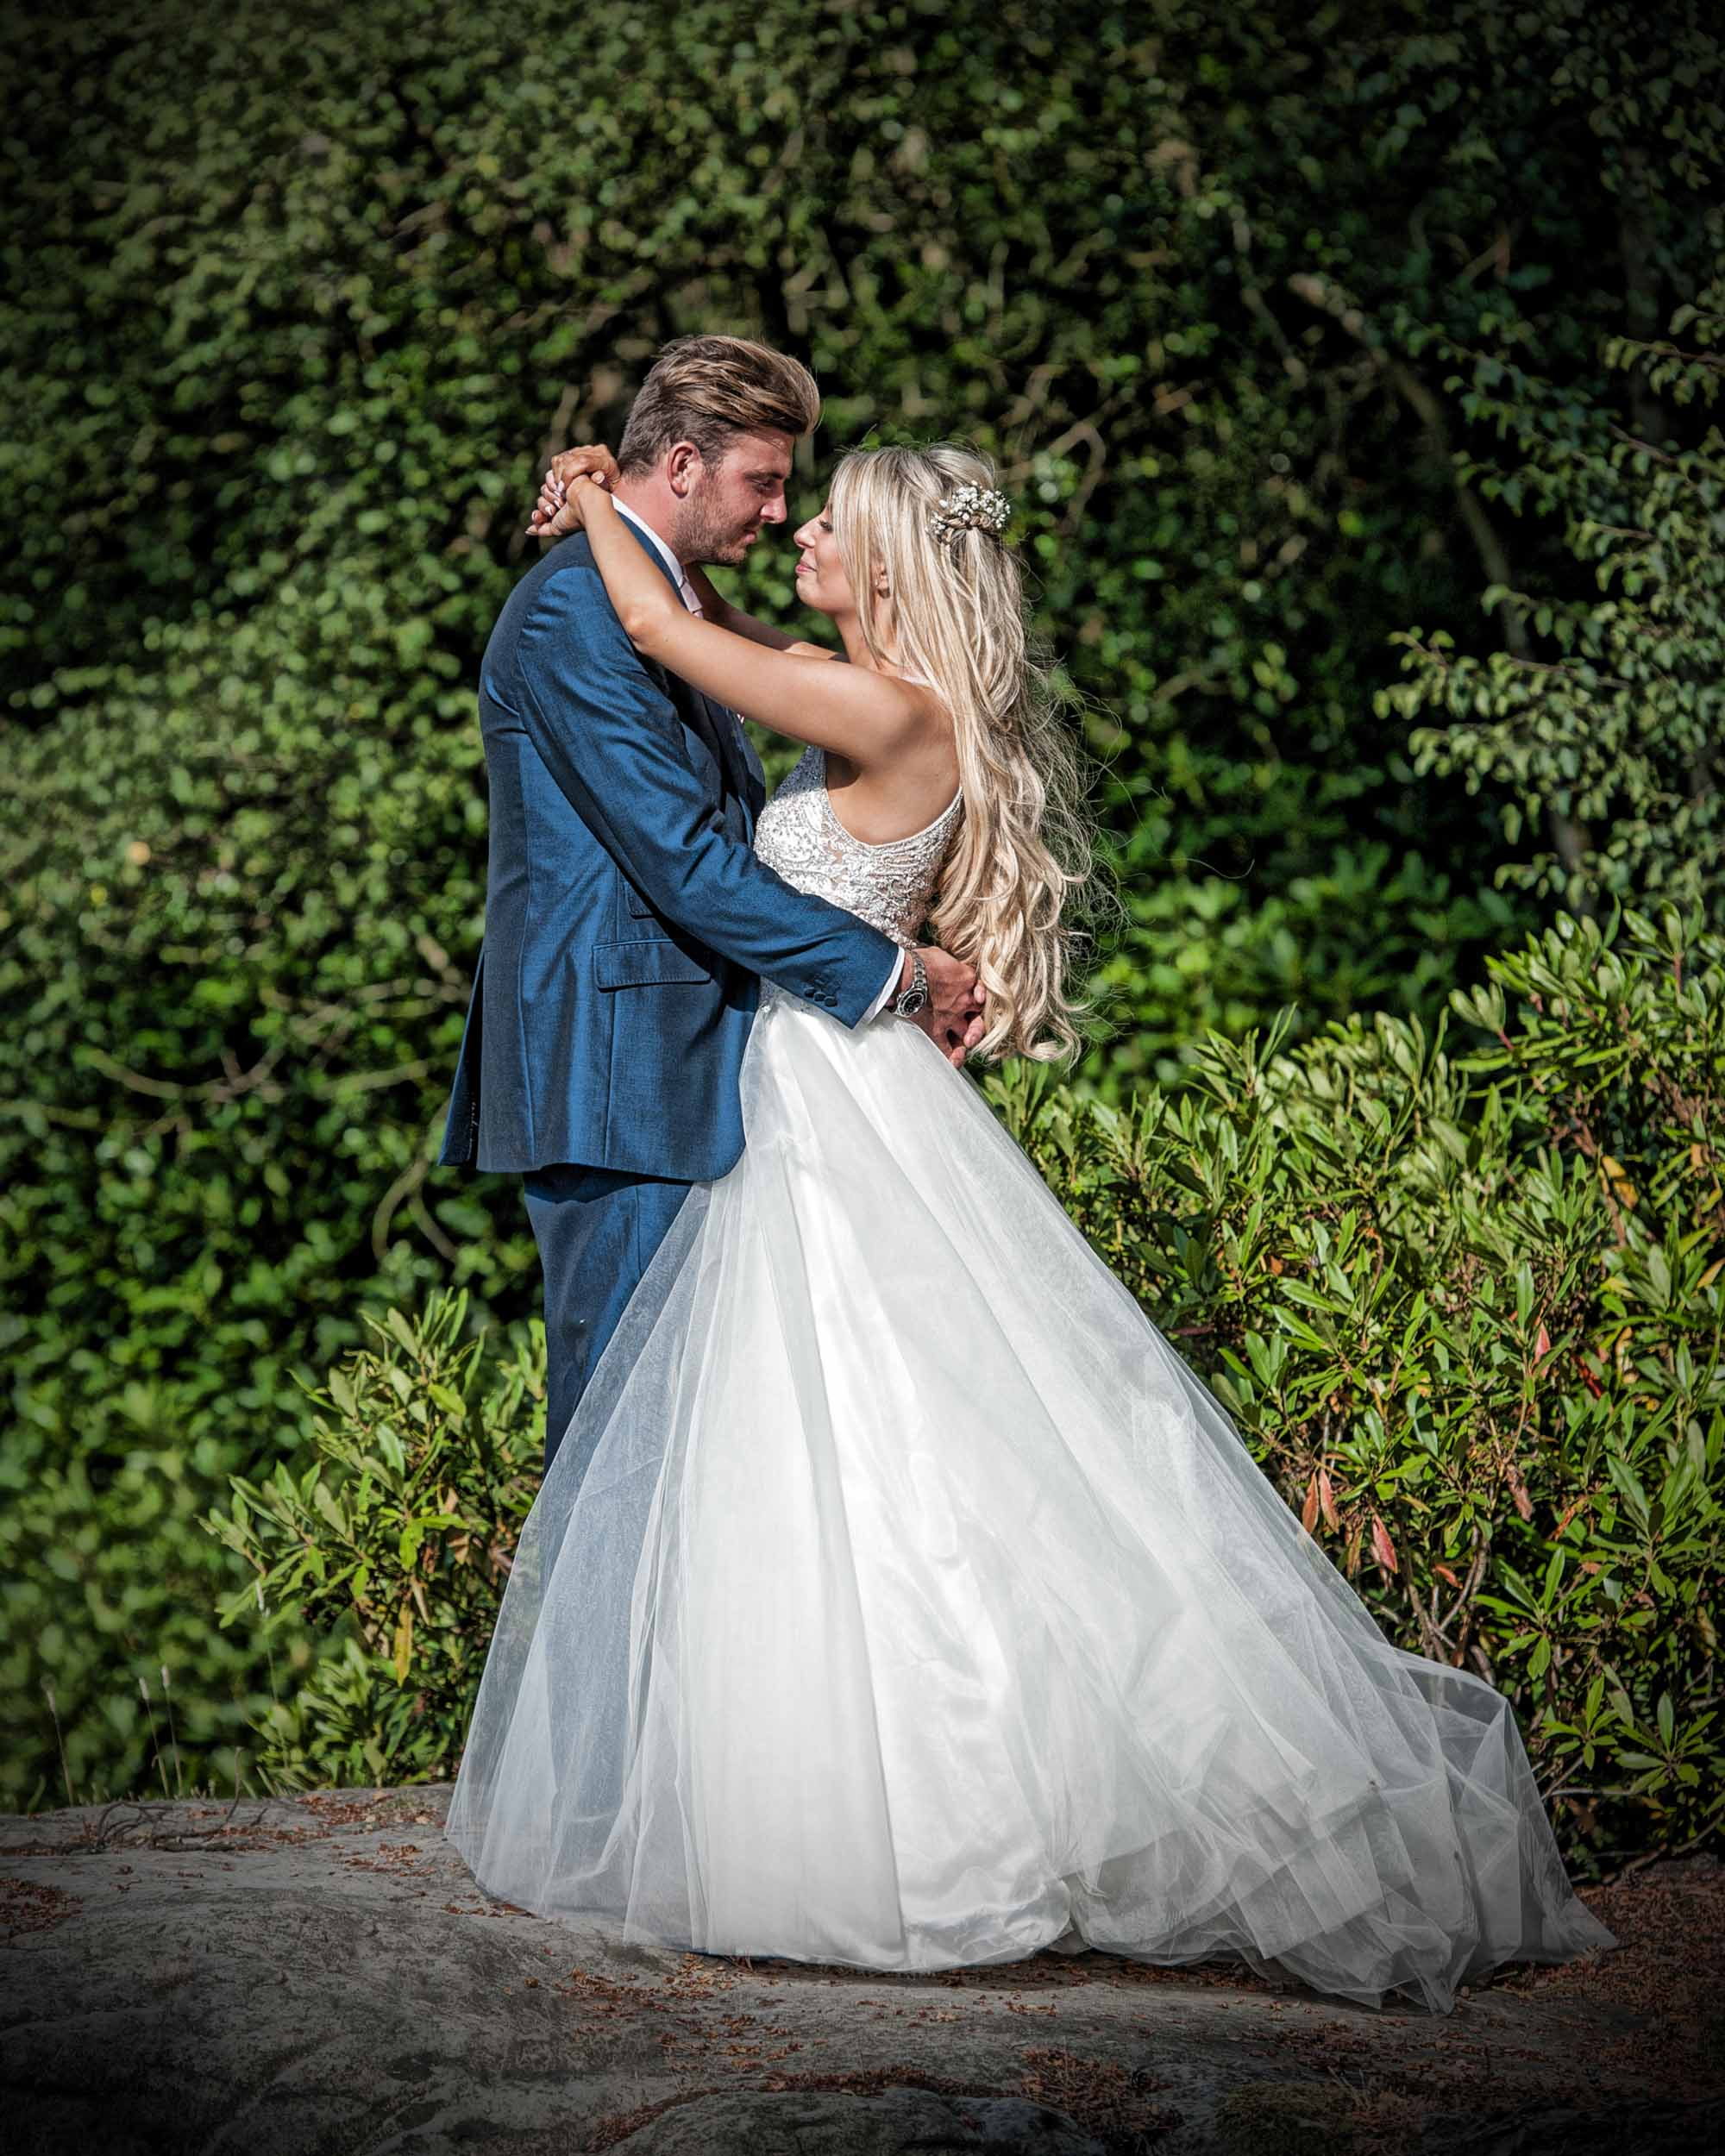 Emma&Victorwedding_0053_edited-1